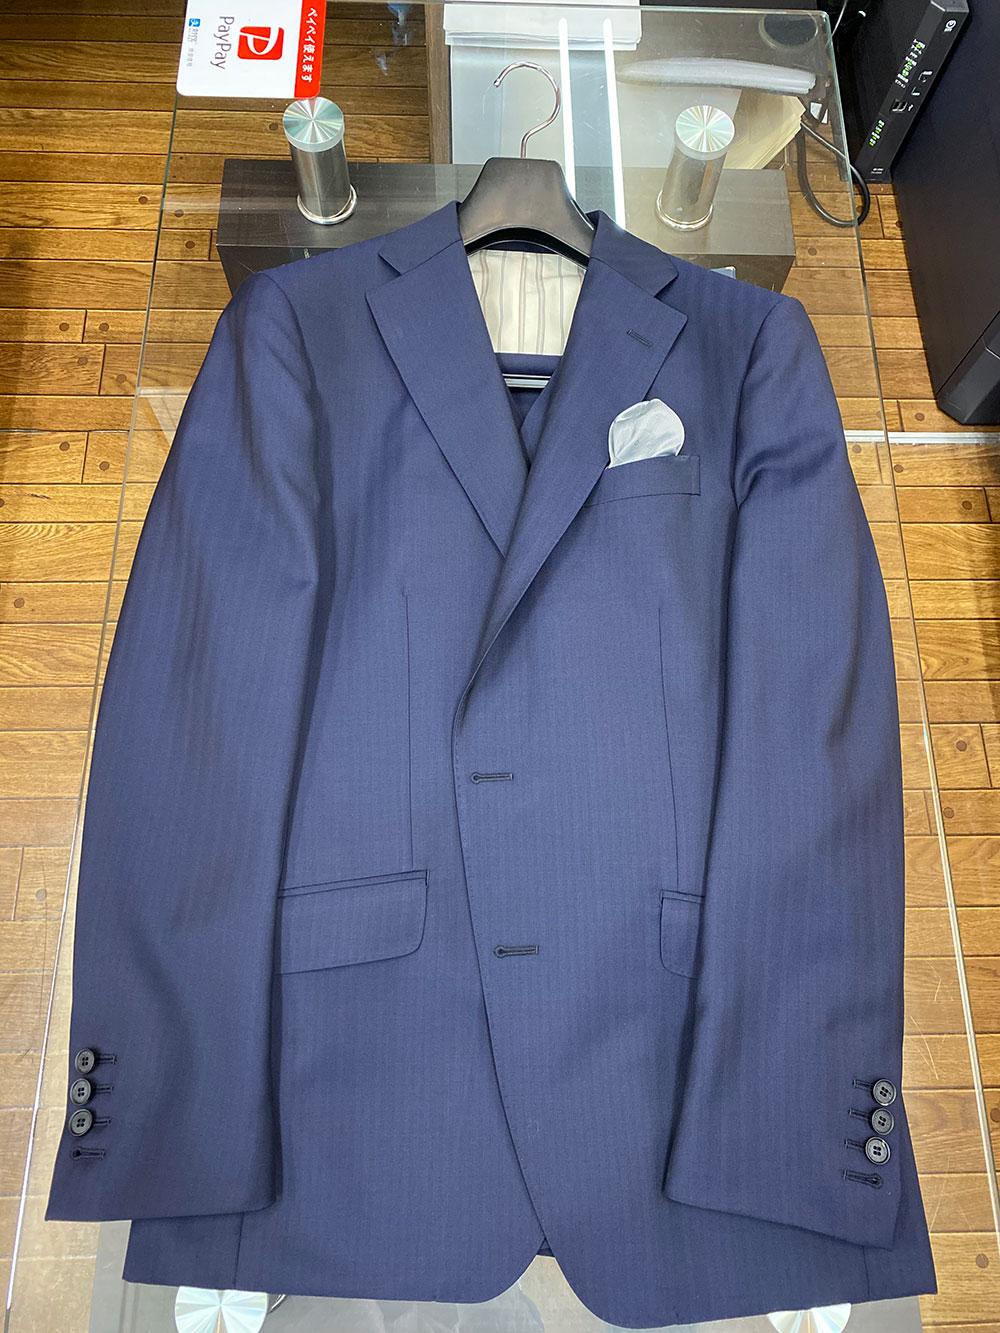 A様 エルメネジルド・ゼニア トラベラーのオーダースーツ